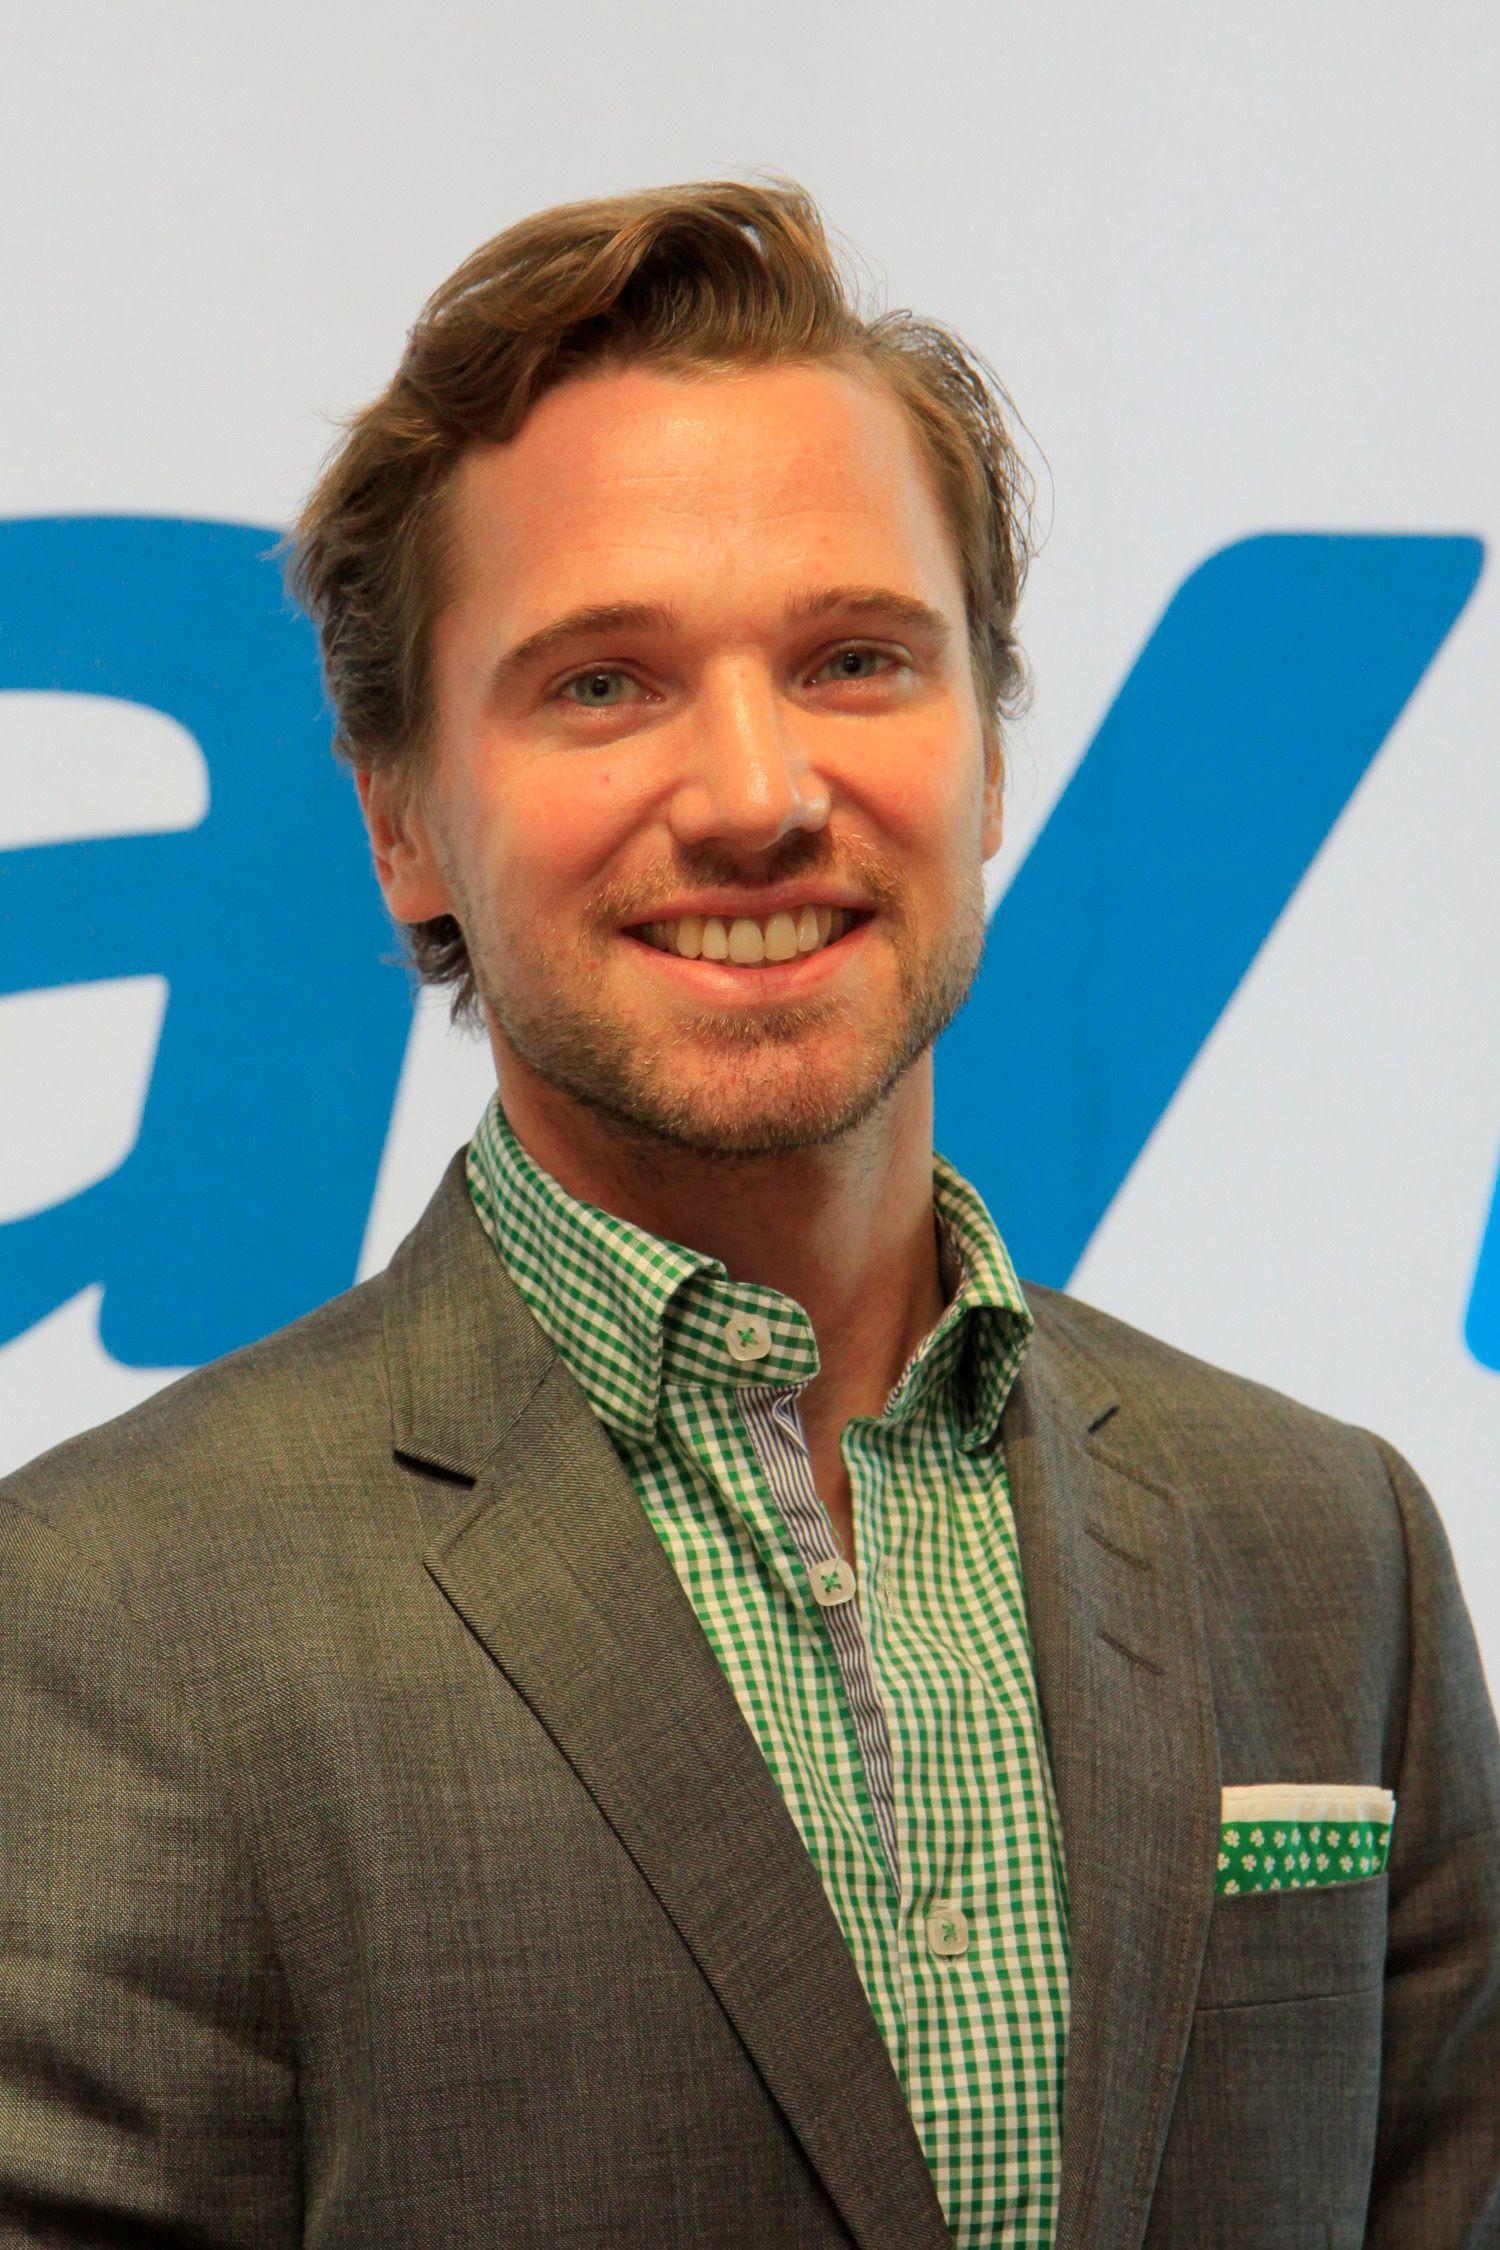 Daniel Aronowitsch, salgssjef i PayPal.Foto: Kurt Lekanger, Mobilen.no